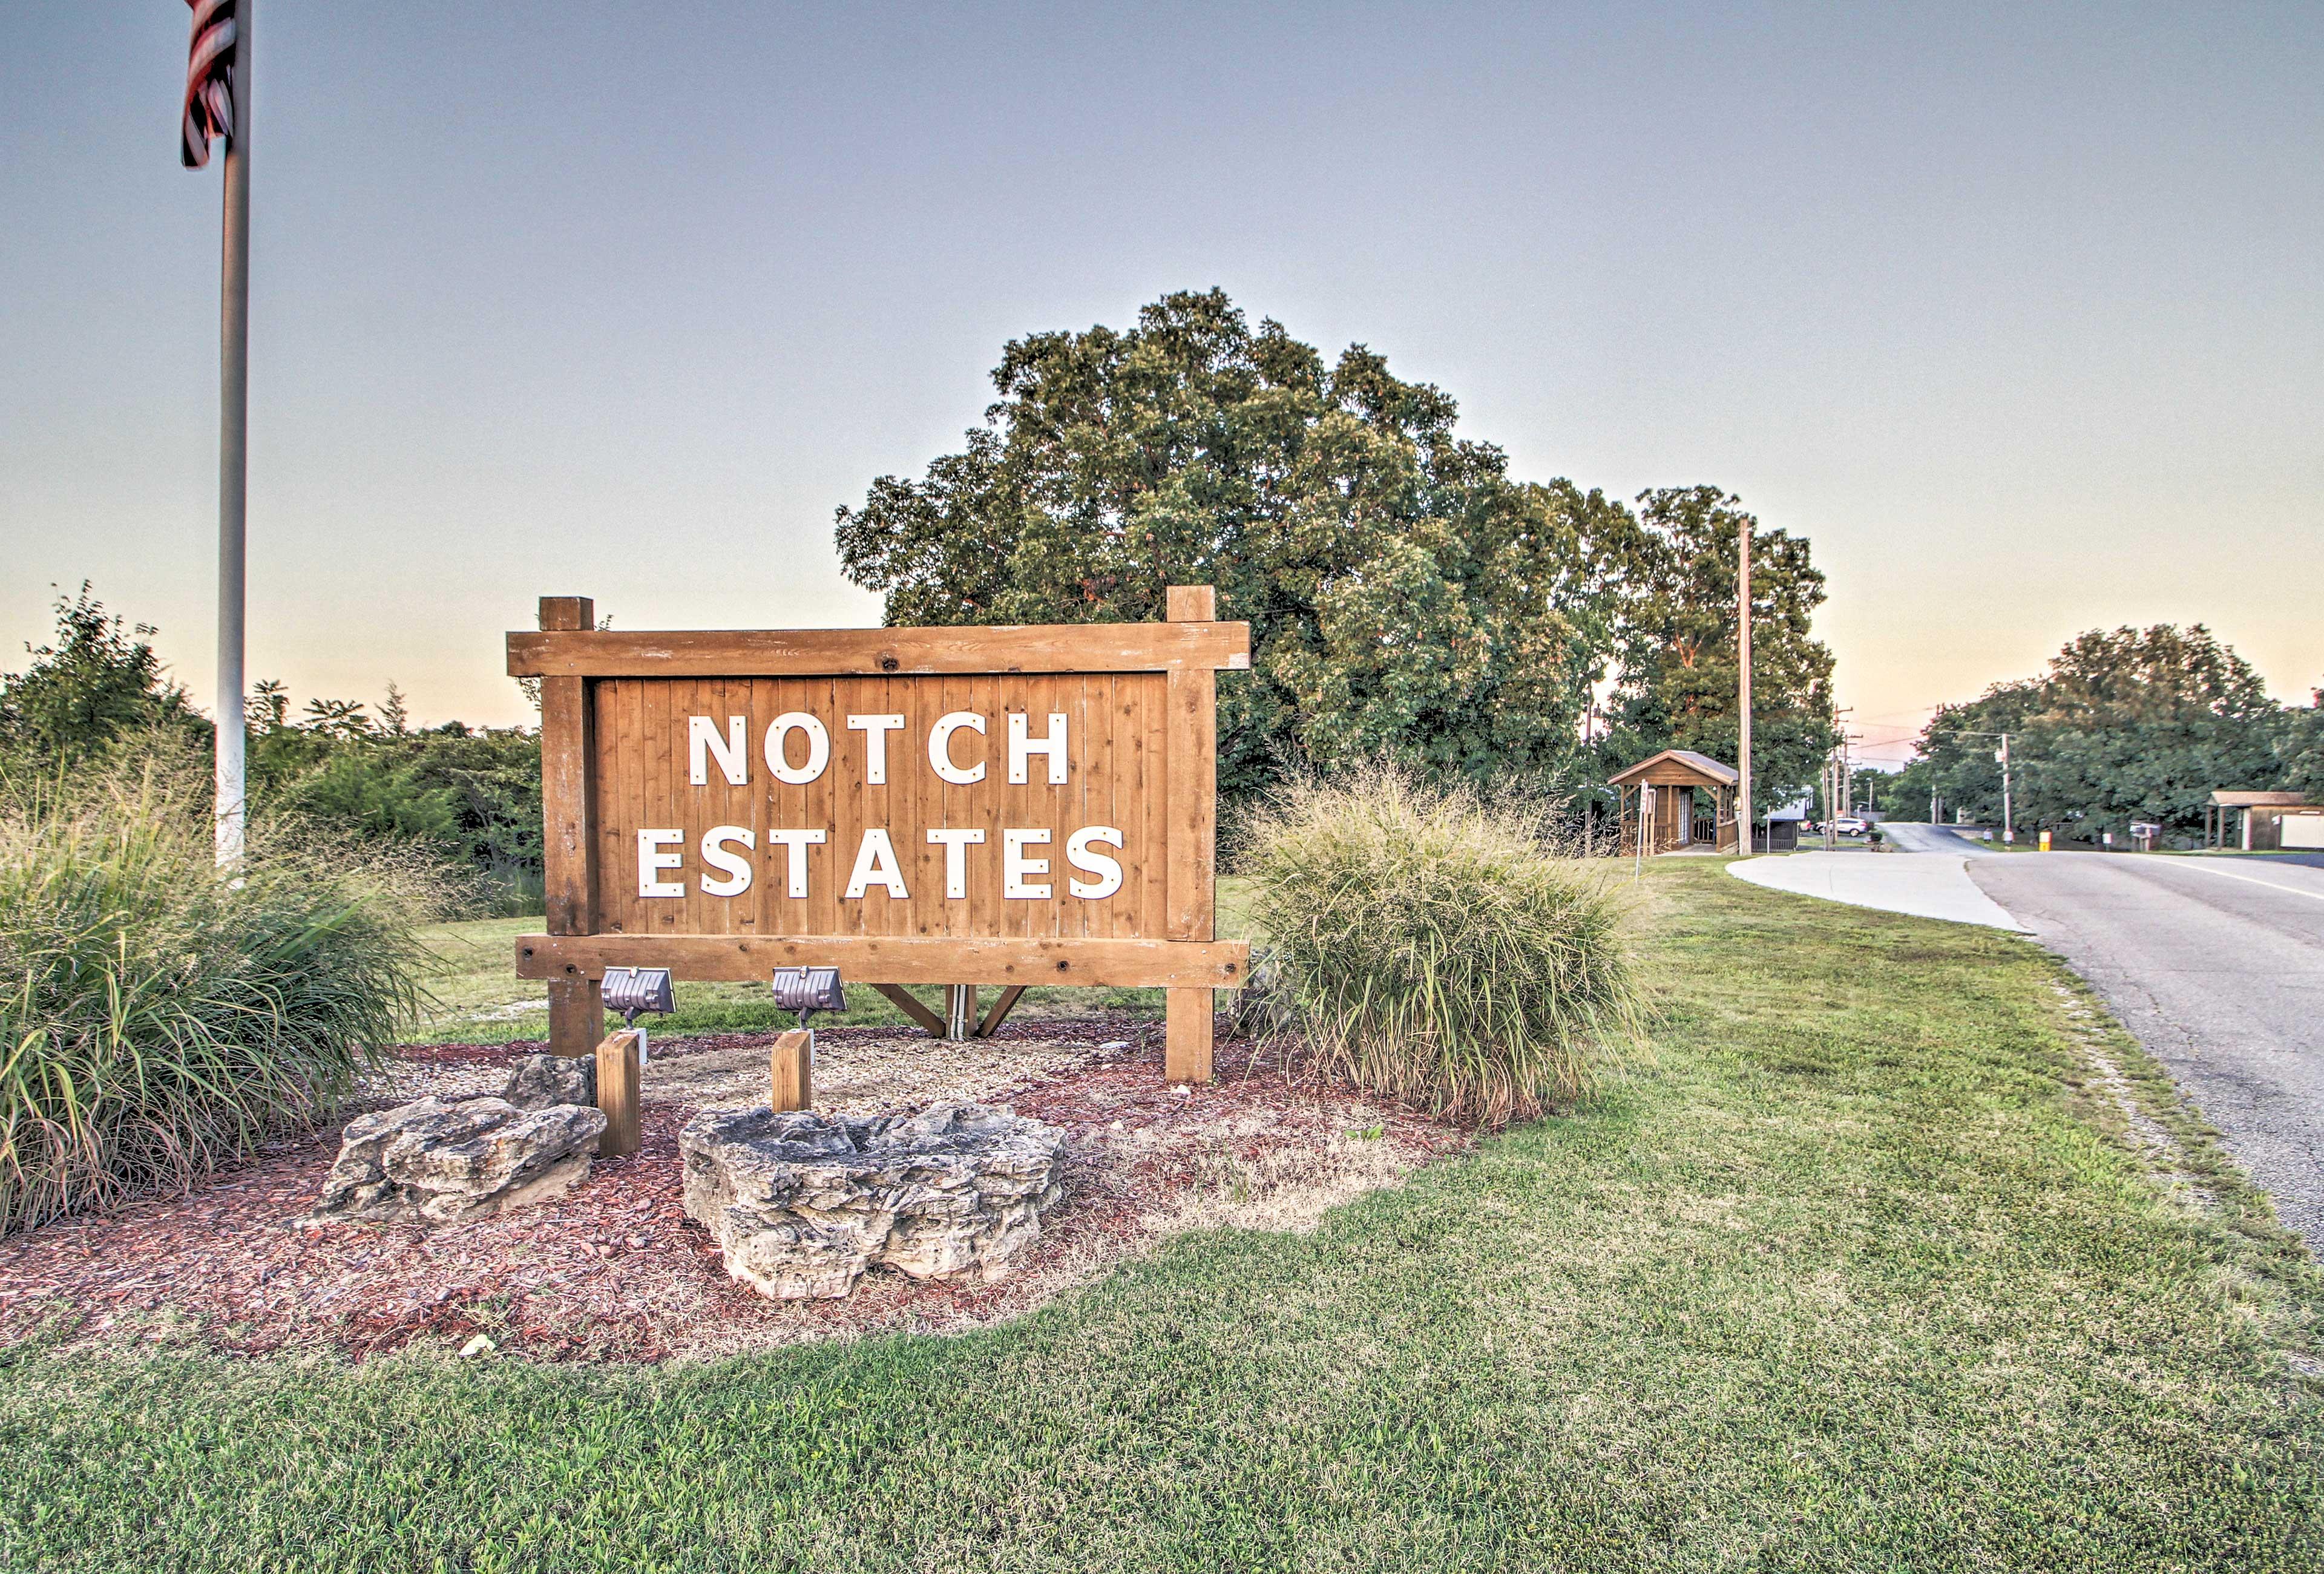 Notch Estates is sure to impress!